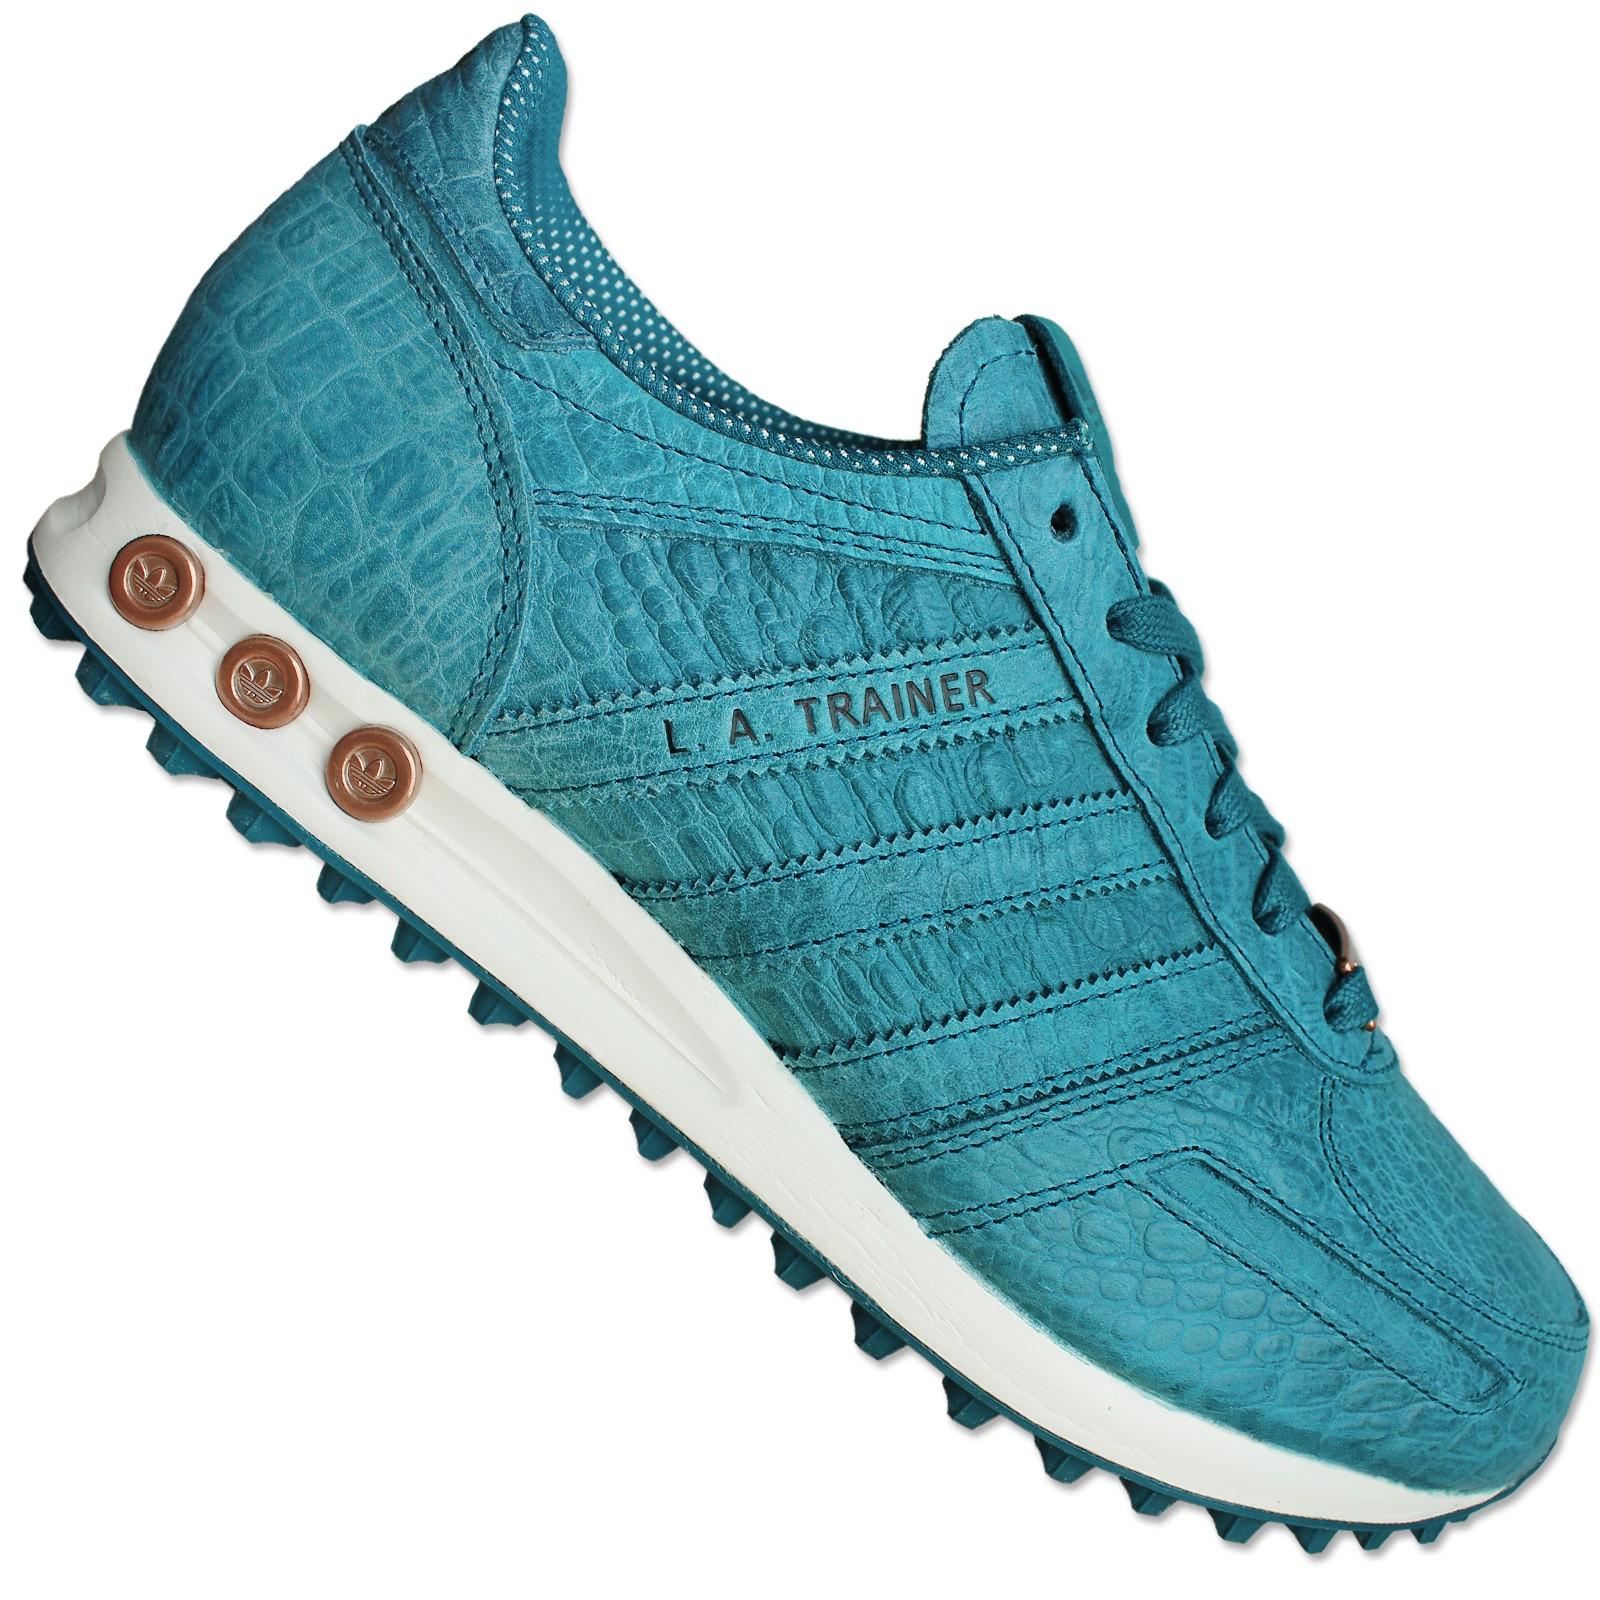 adidas originals la trainer sneaker s78361 schuhe torsion. Black Bedroom Furniture Sets. Home Design Ideas